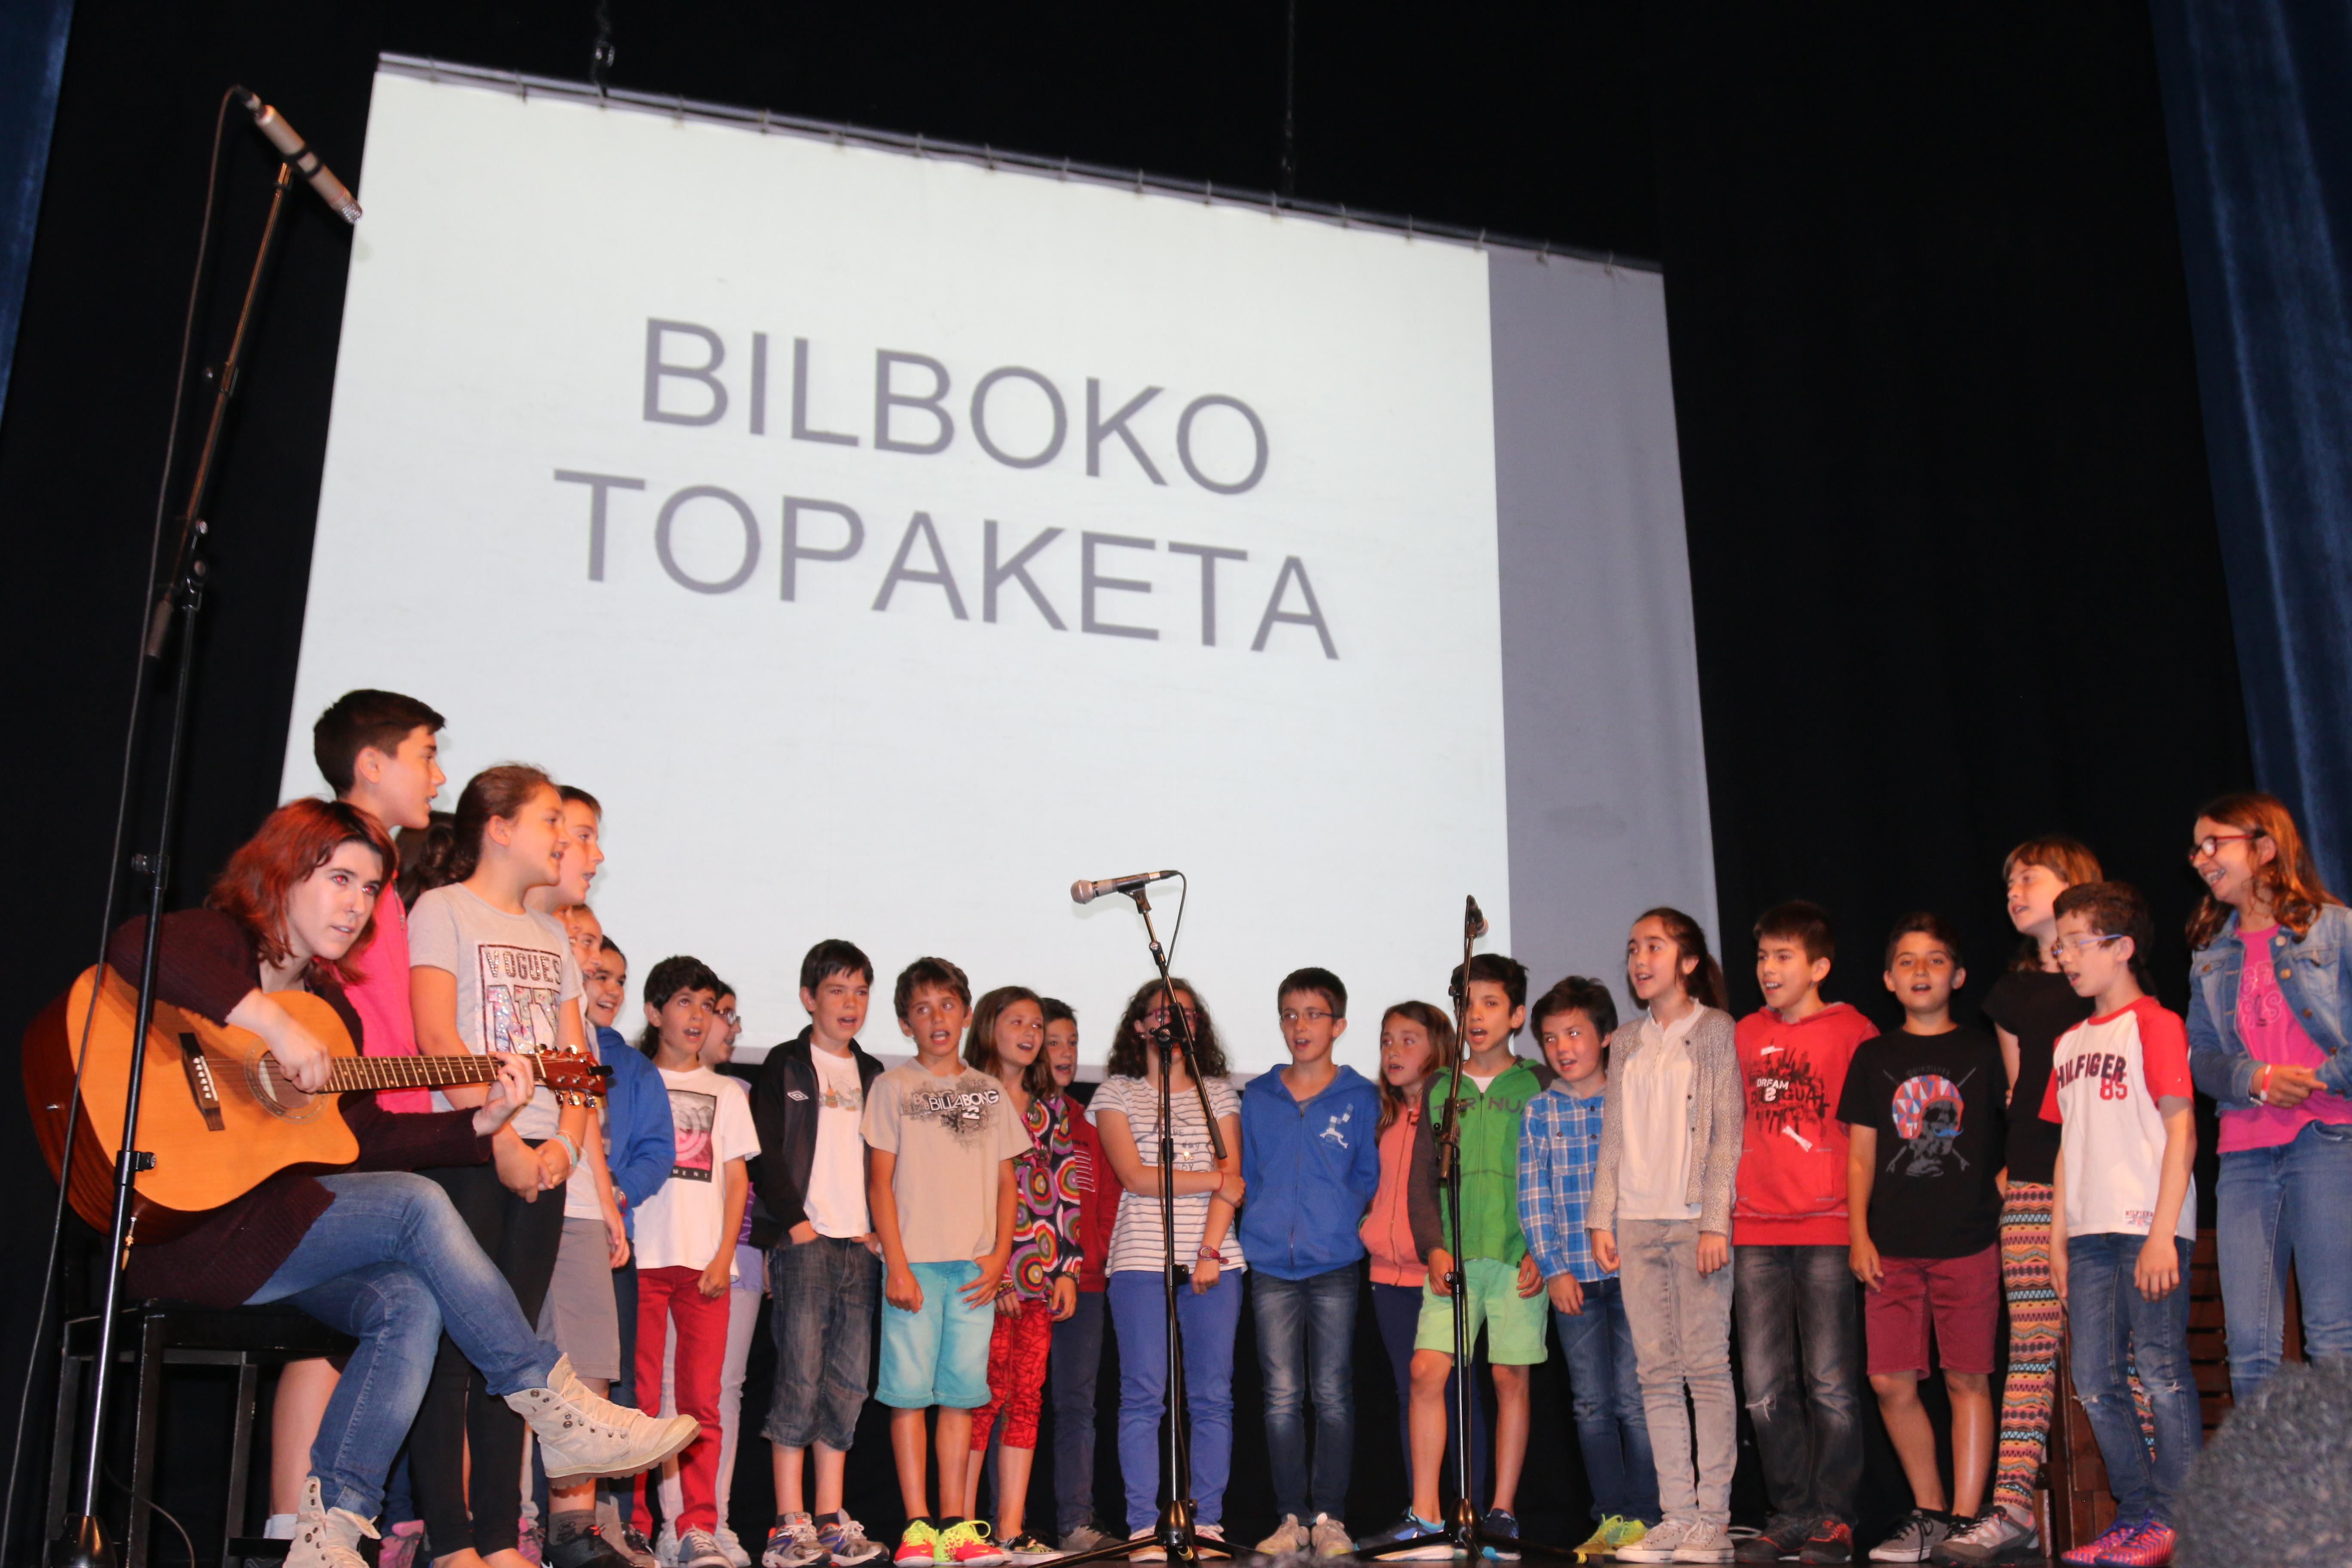 Bilboko topaketa 2015-06-12